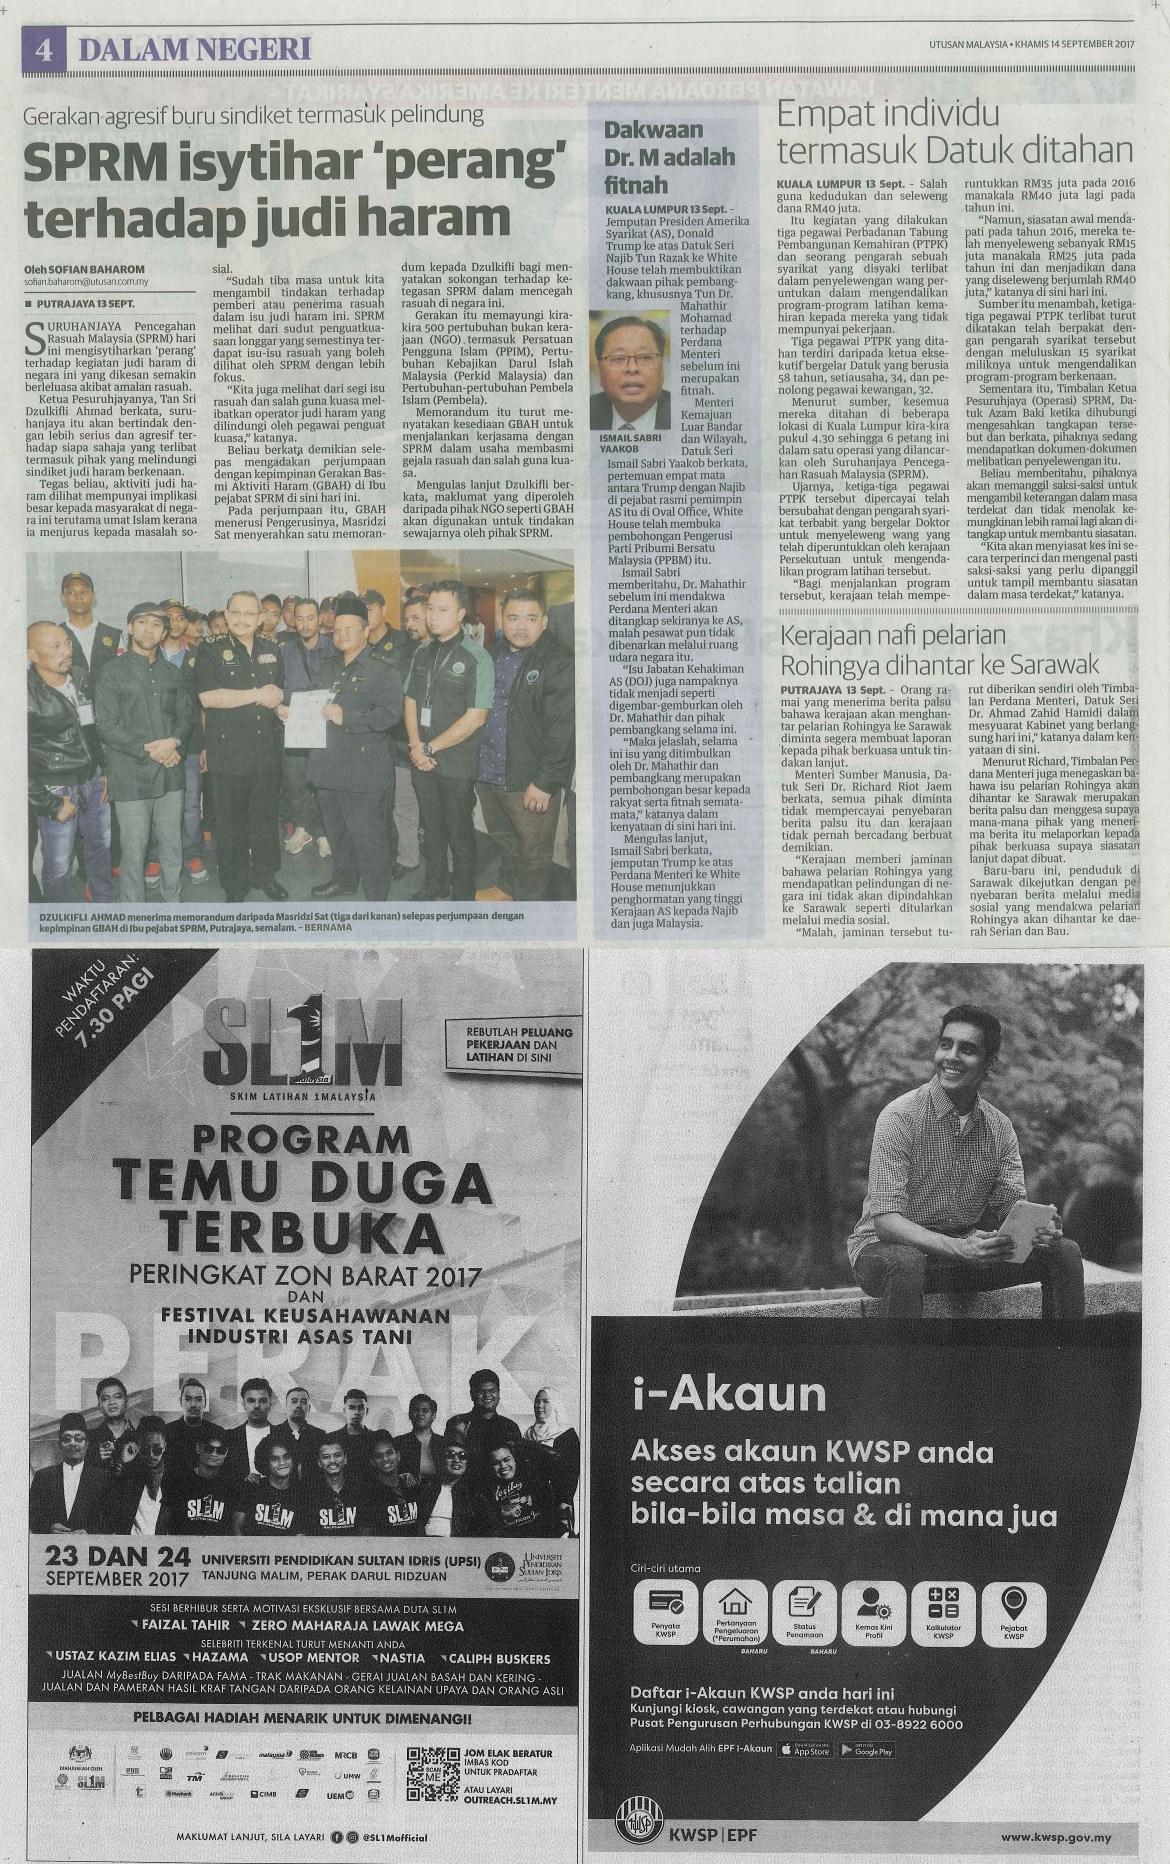 utusan malaysia 14.9.2017